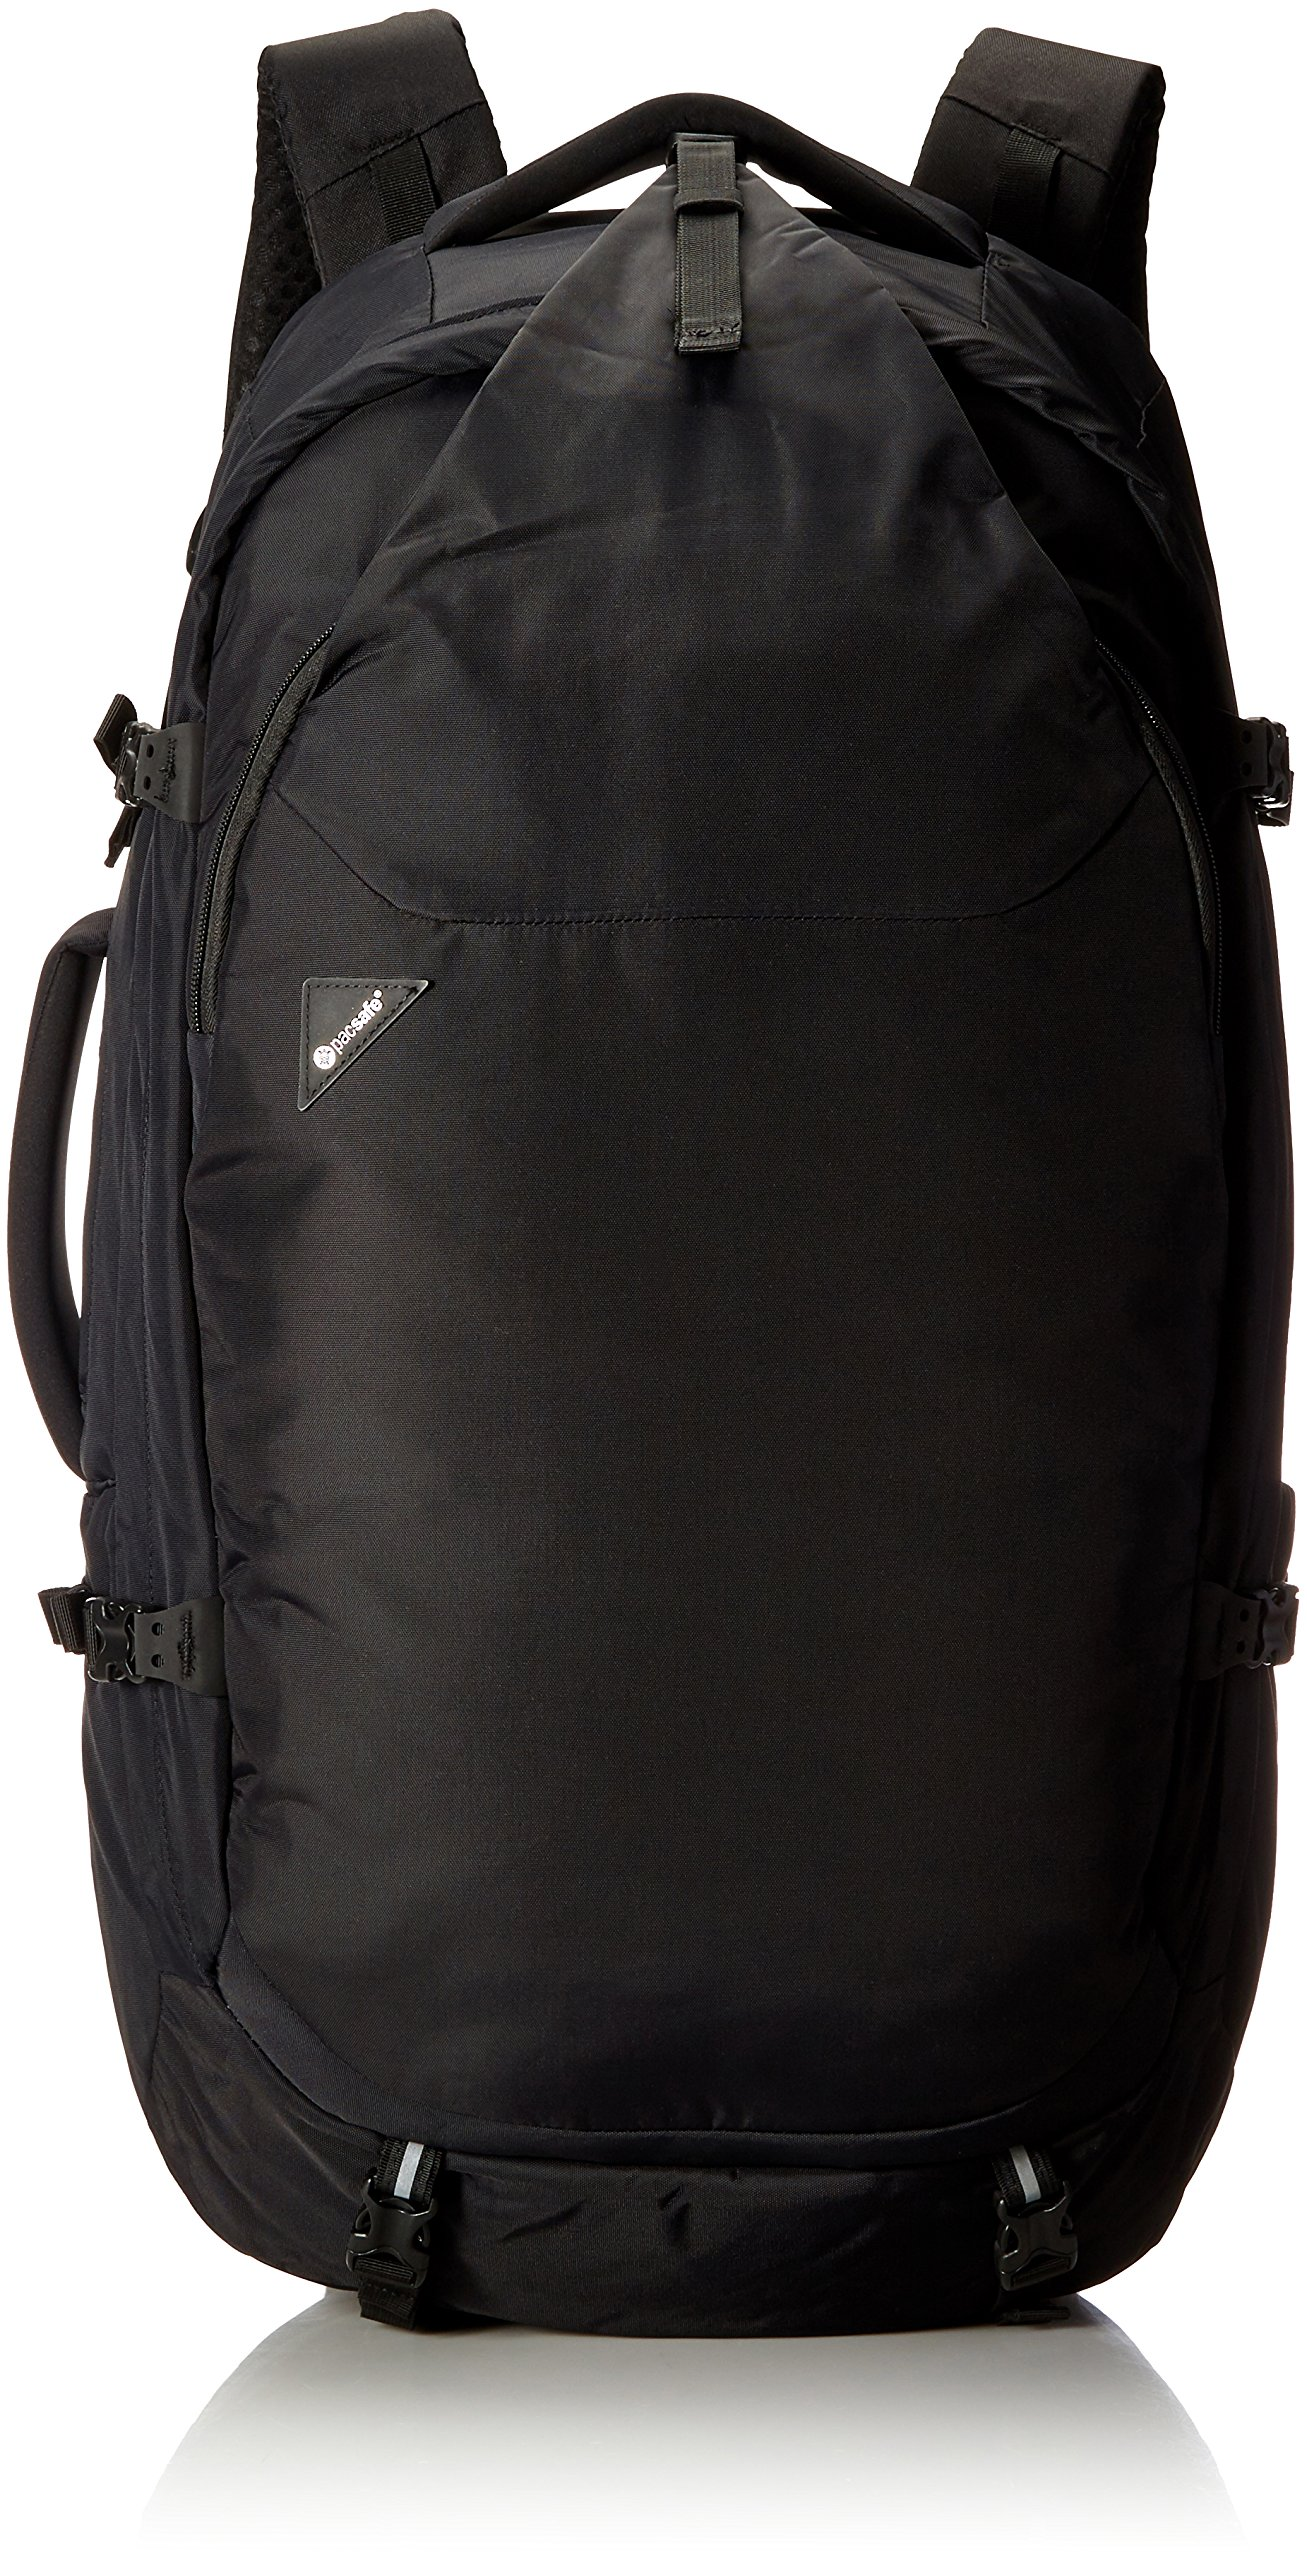 Pacsafe Venturesafe EXP65 Anti-Theft Travel Backpack, Black